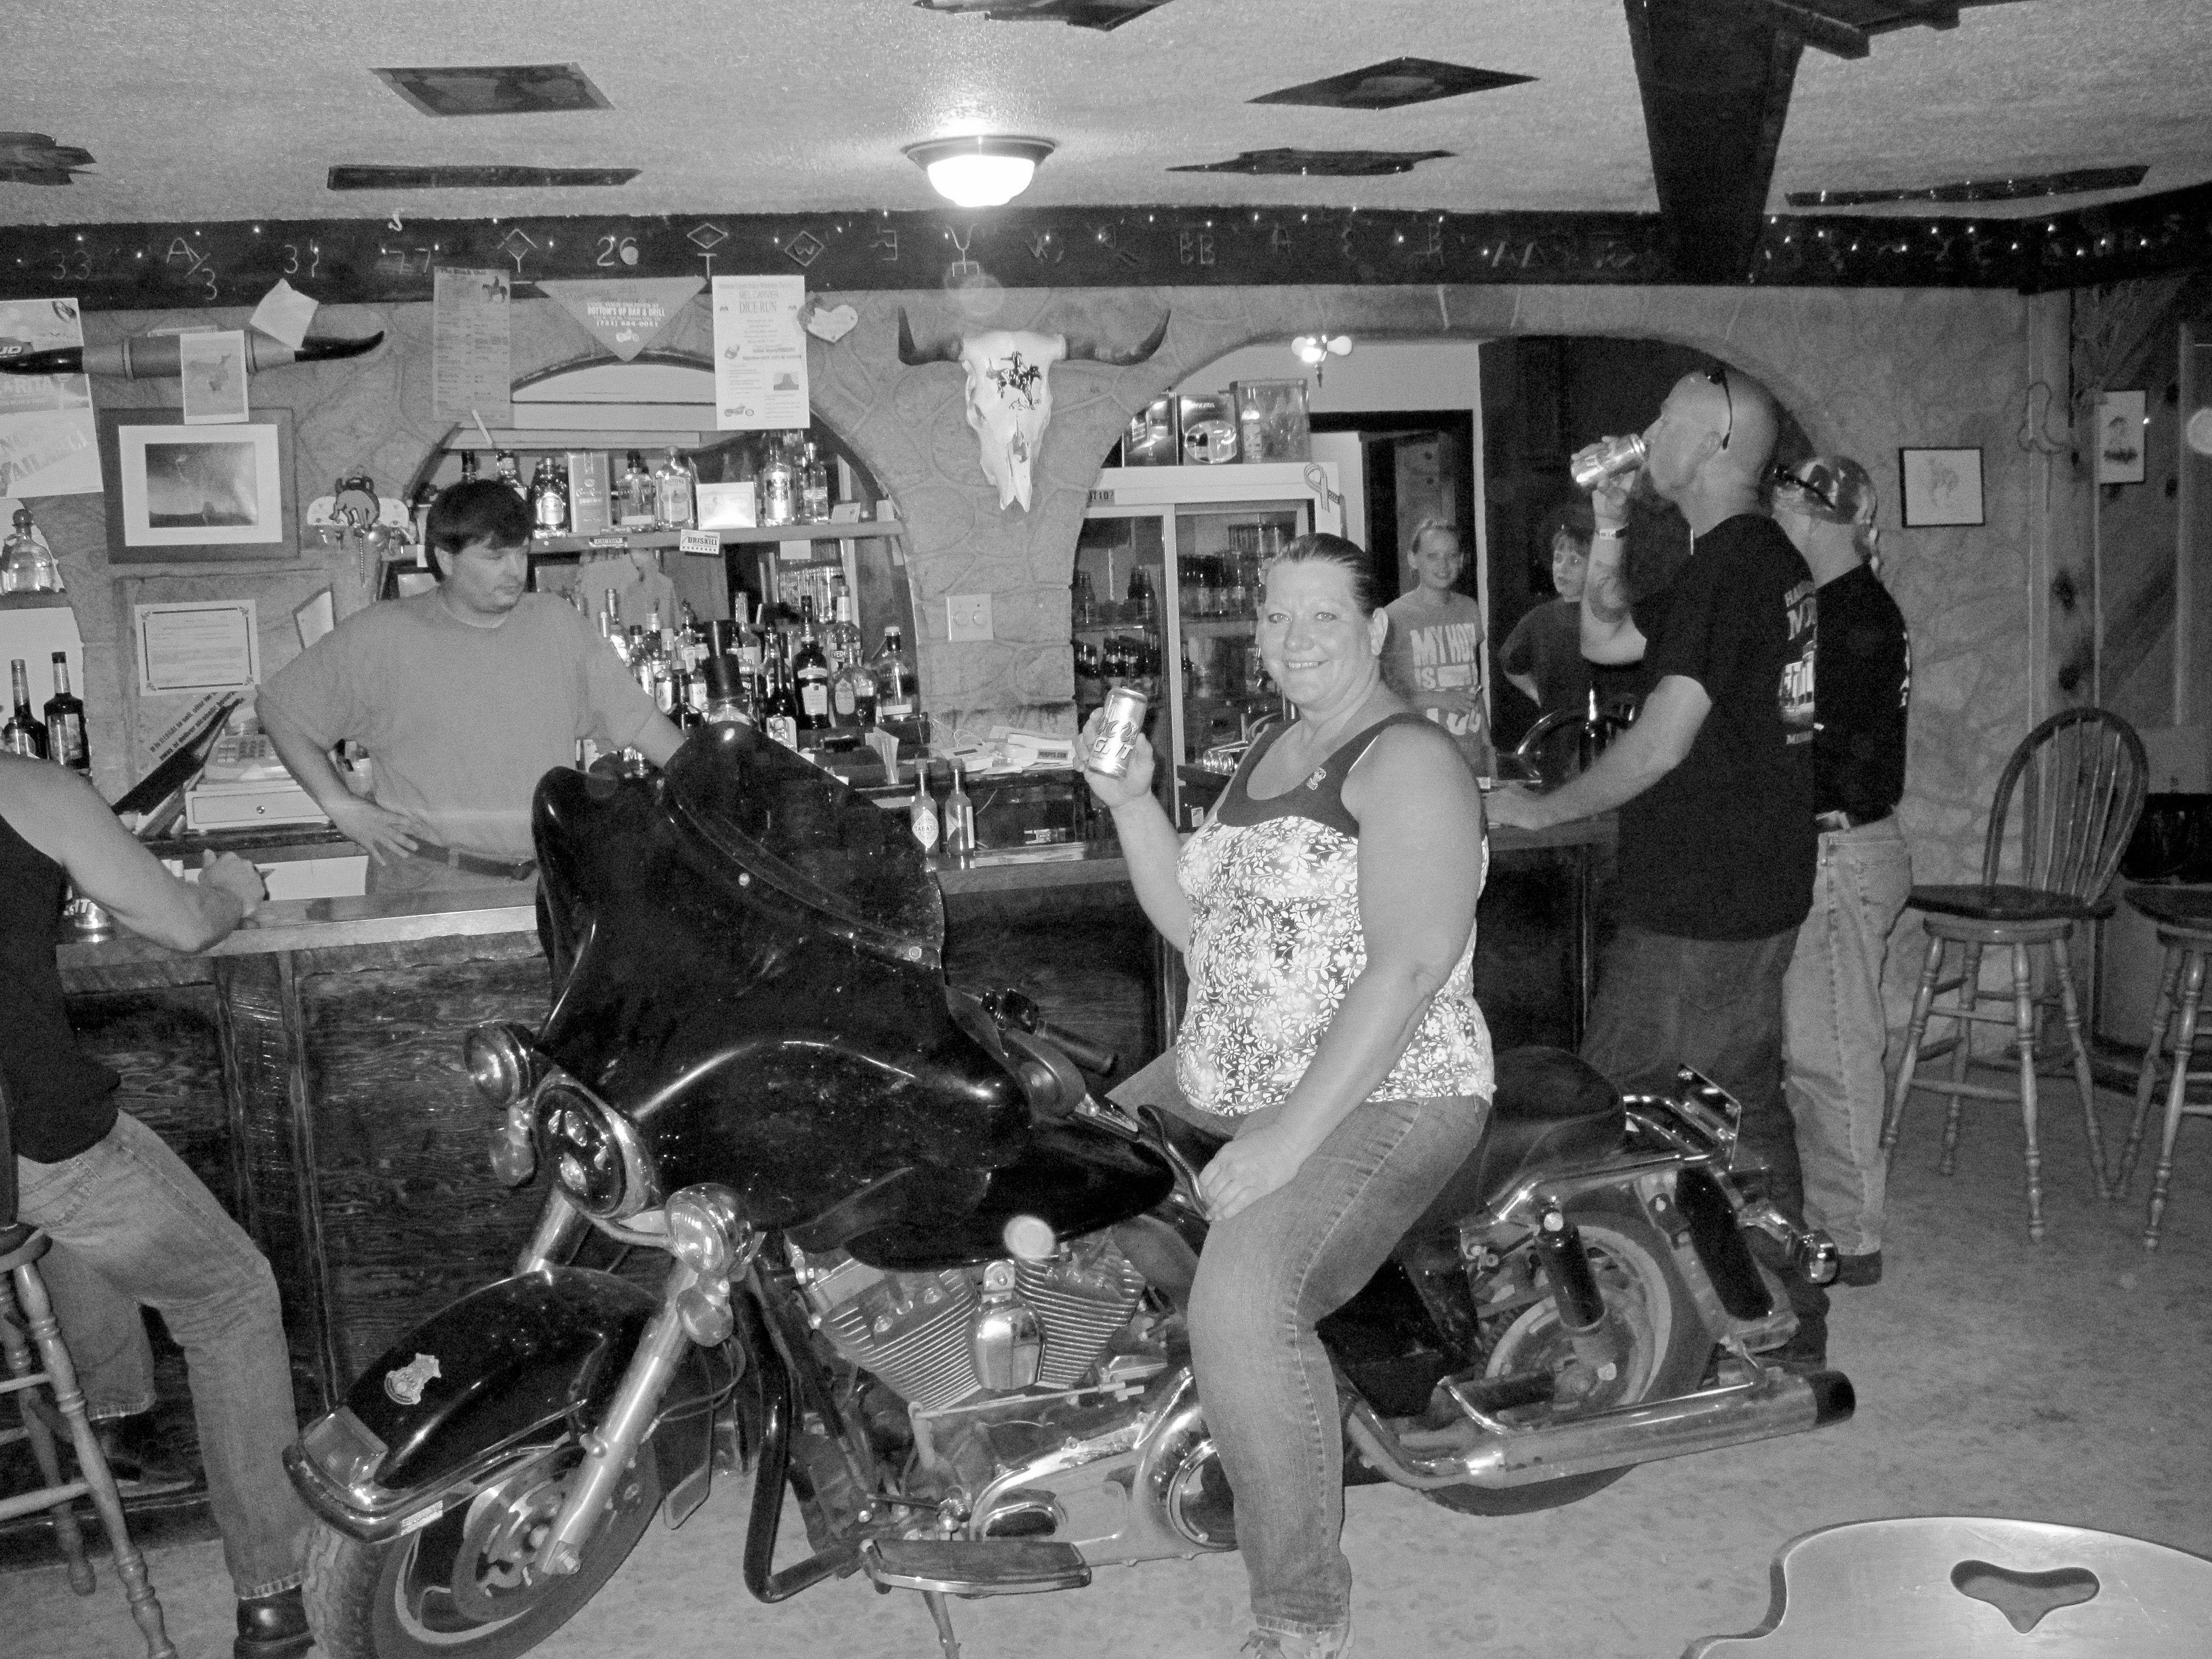 Crook County Saloon, Sundance WY